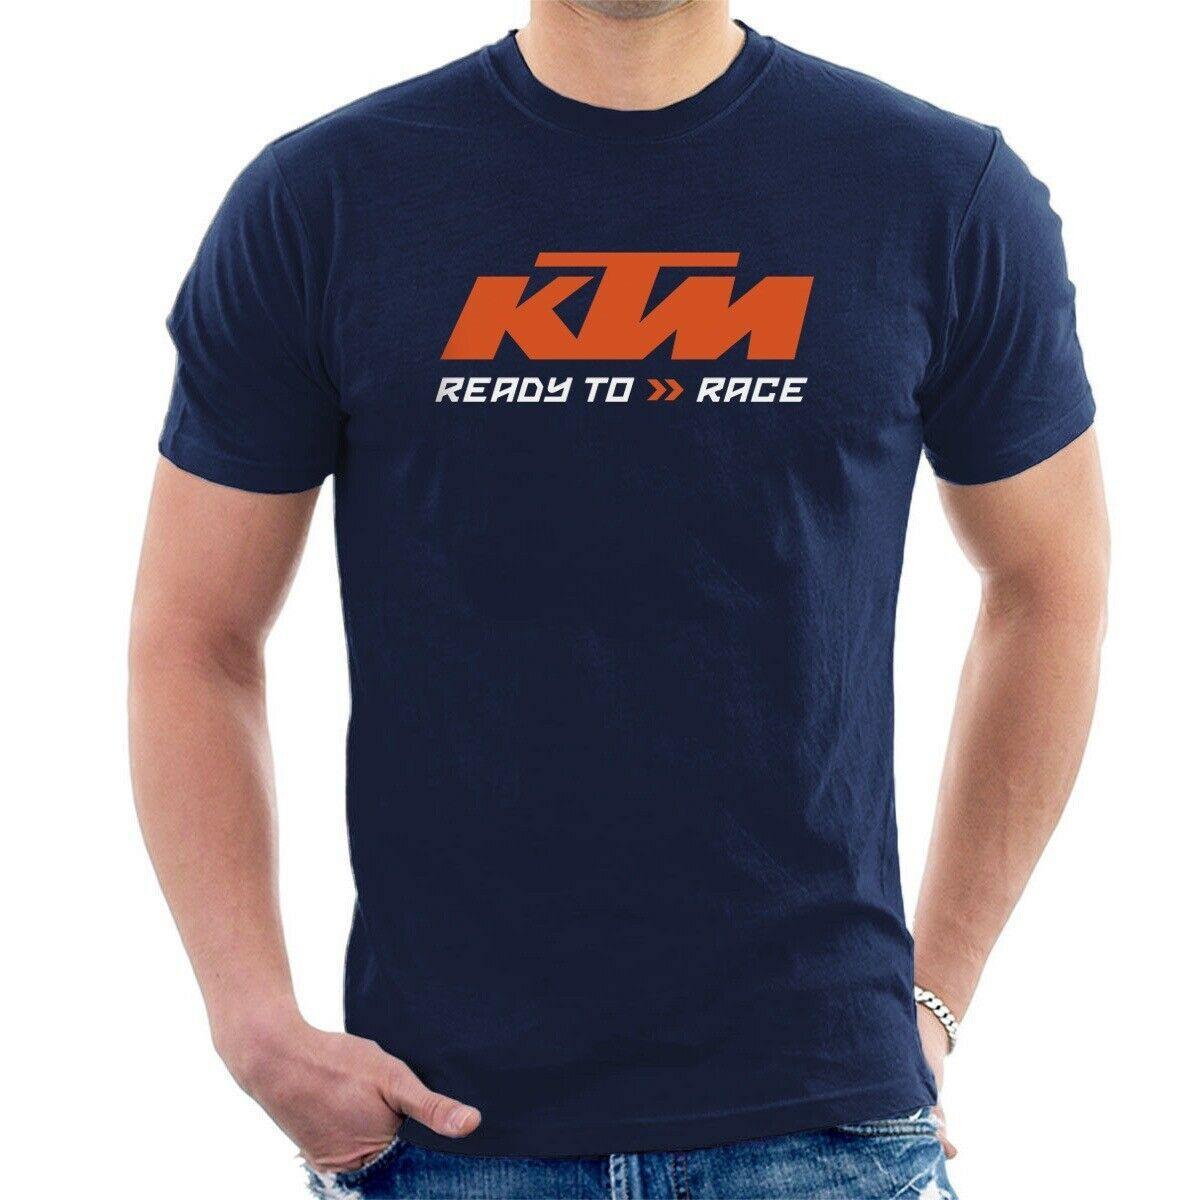 FASHION MENS KTM Racing BikeRide Motocross Motorcycle Black Mens Tee T-Shirt NEW